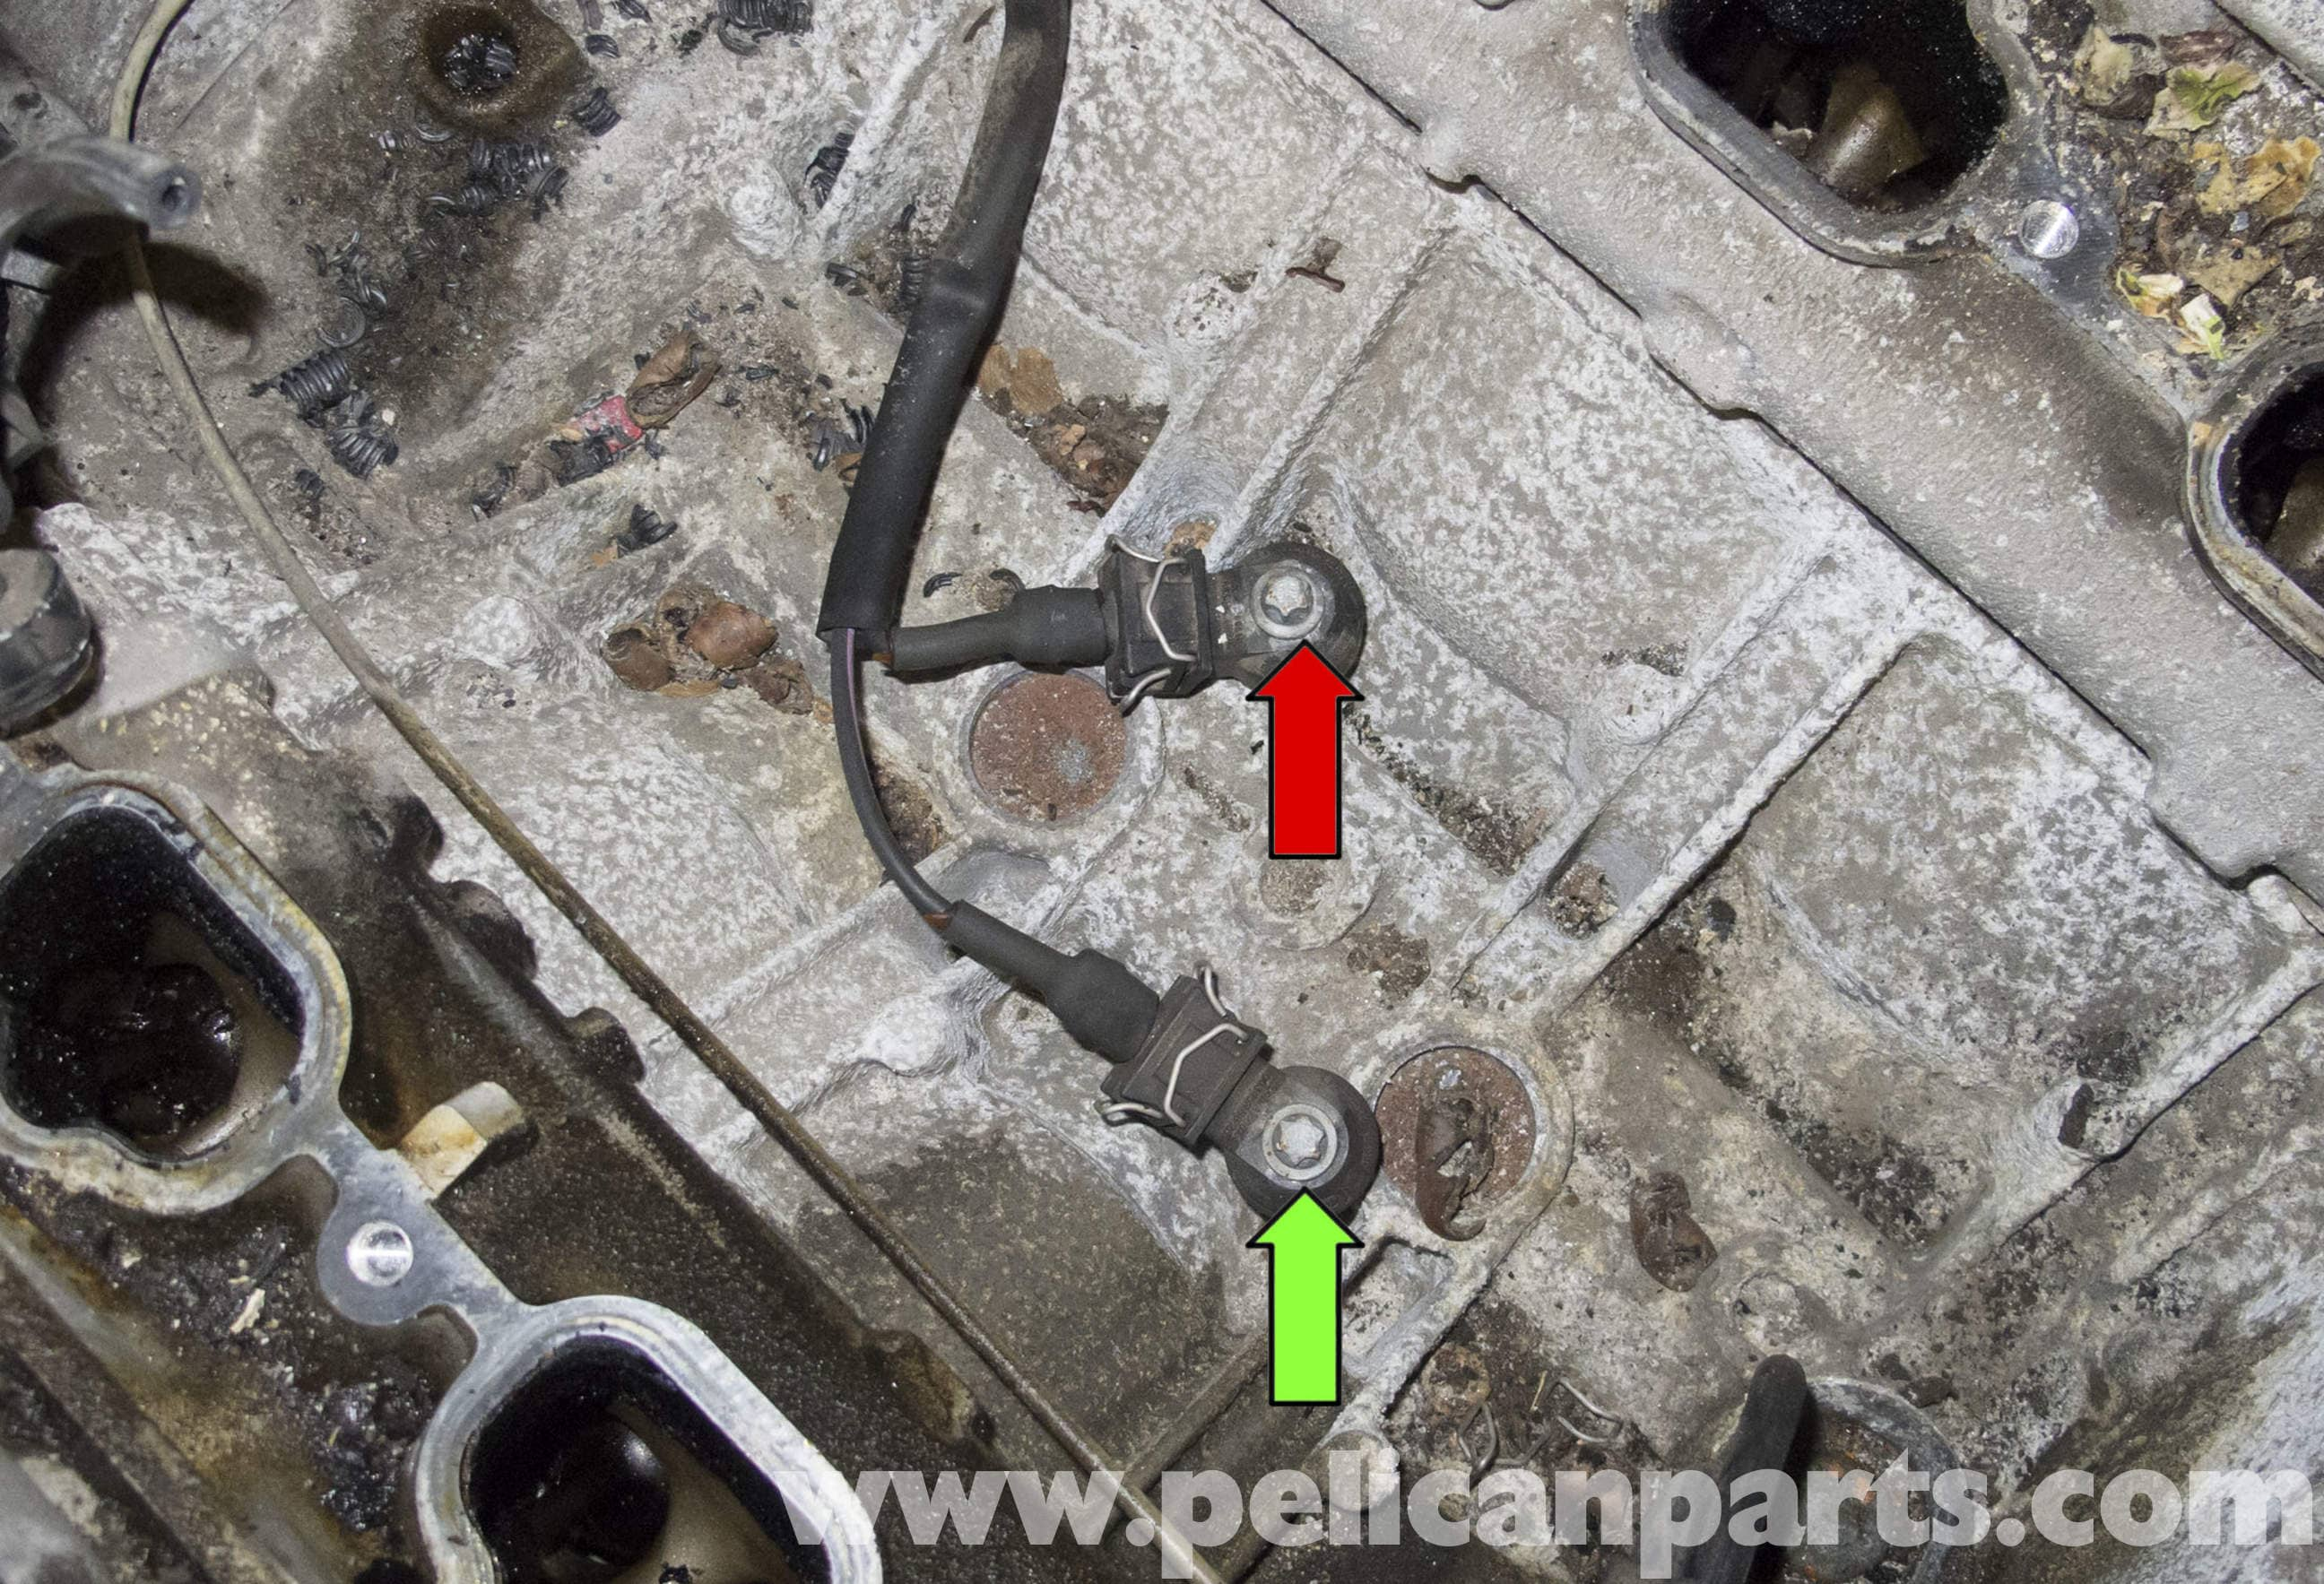 Mercedes Benz W211 Knock Sensor Testing And Replacement 2003 2009 E320 Pelican Parts Diy